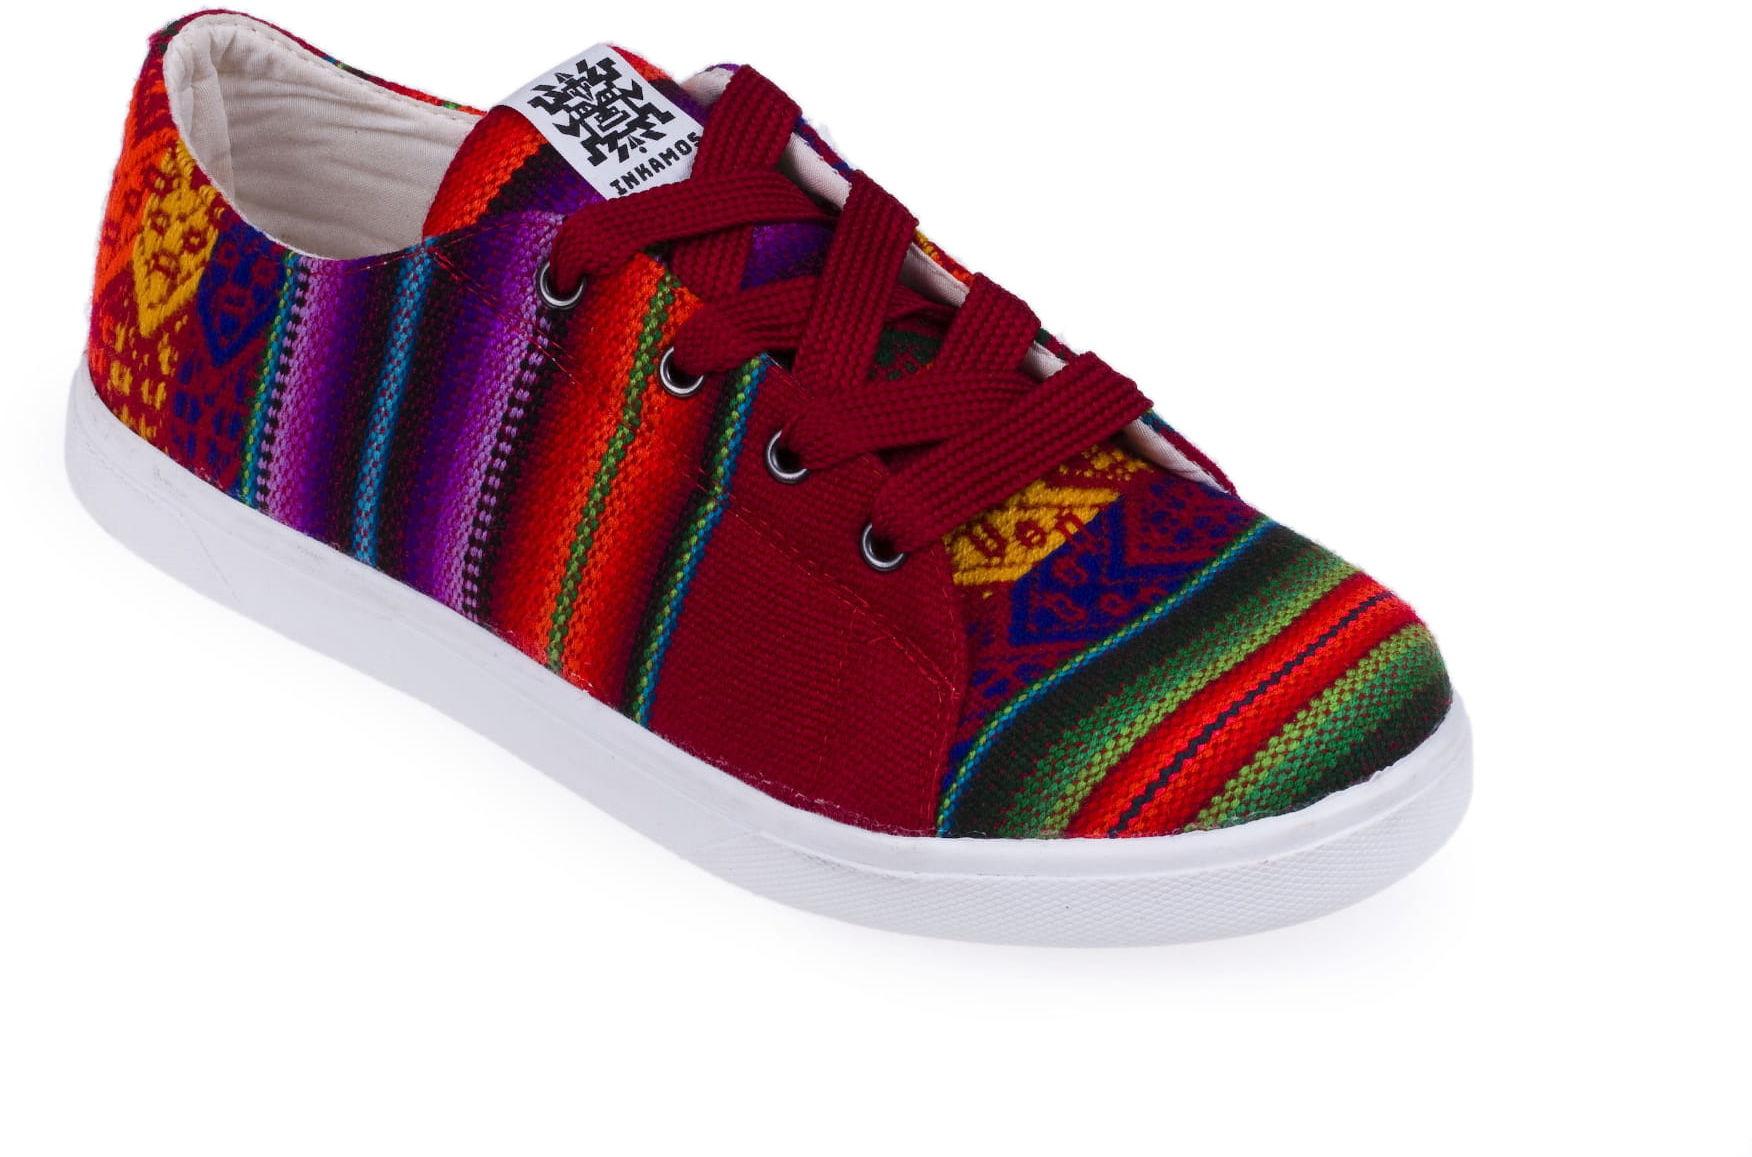 Trampki Inkamos Corto Rojo, oryginalne buty z Peru